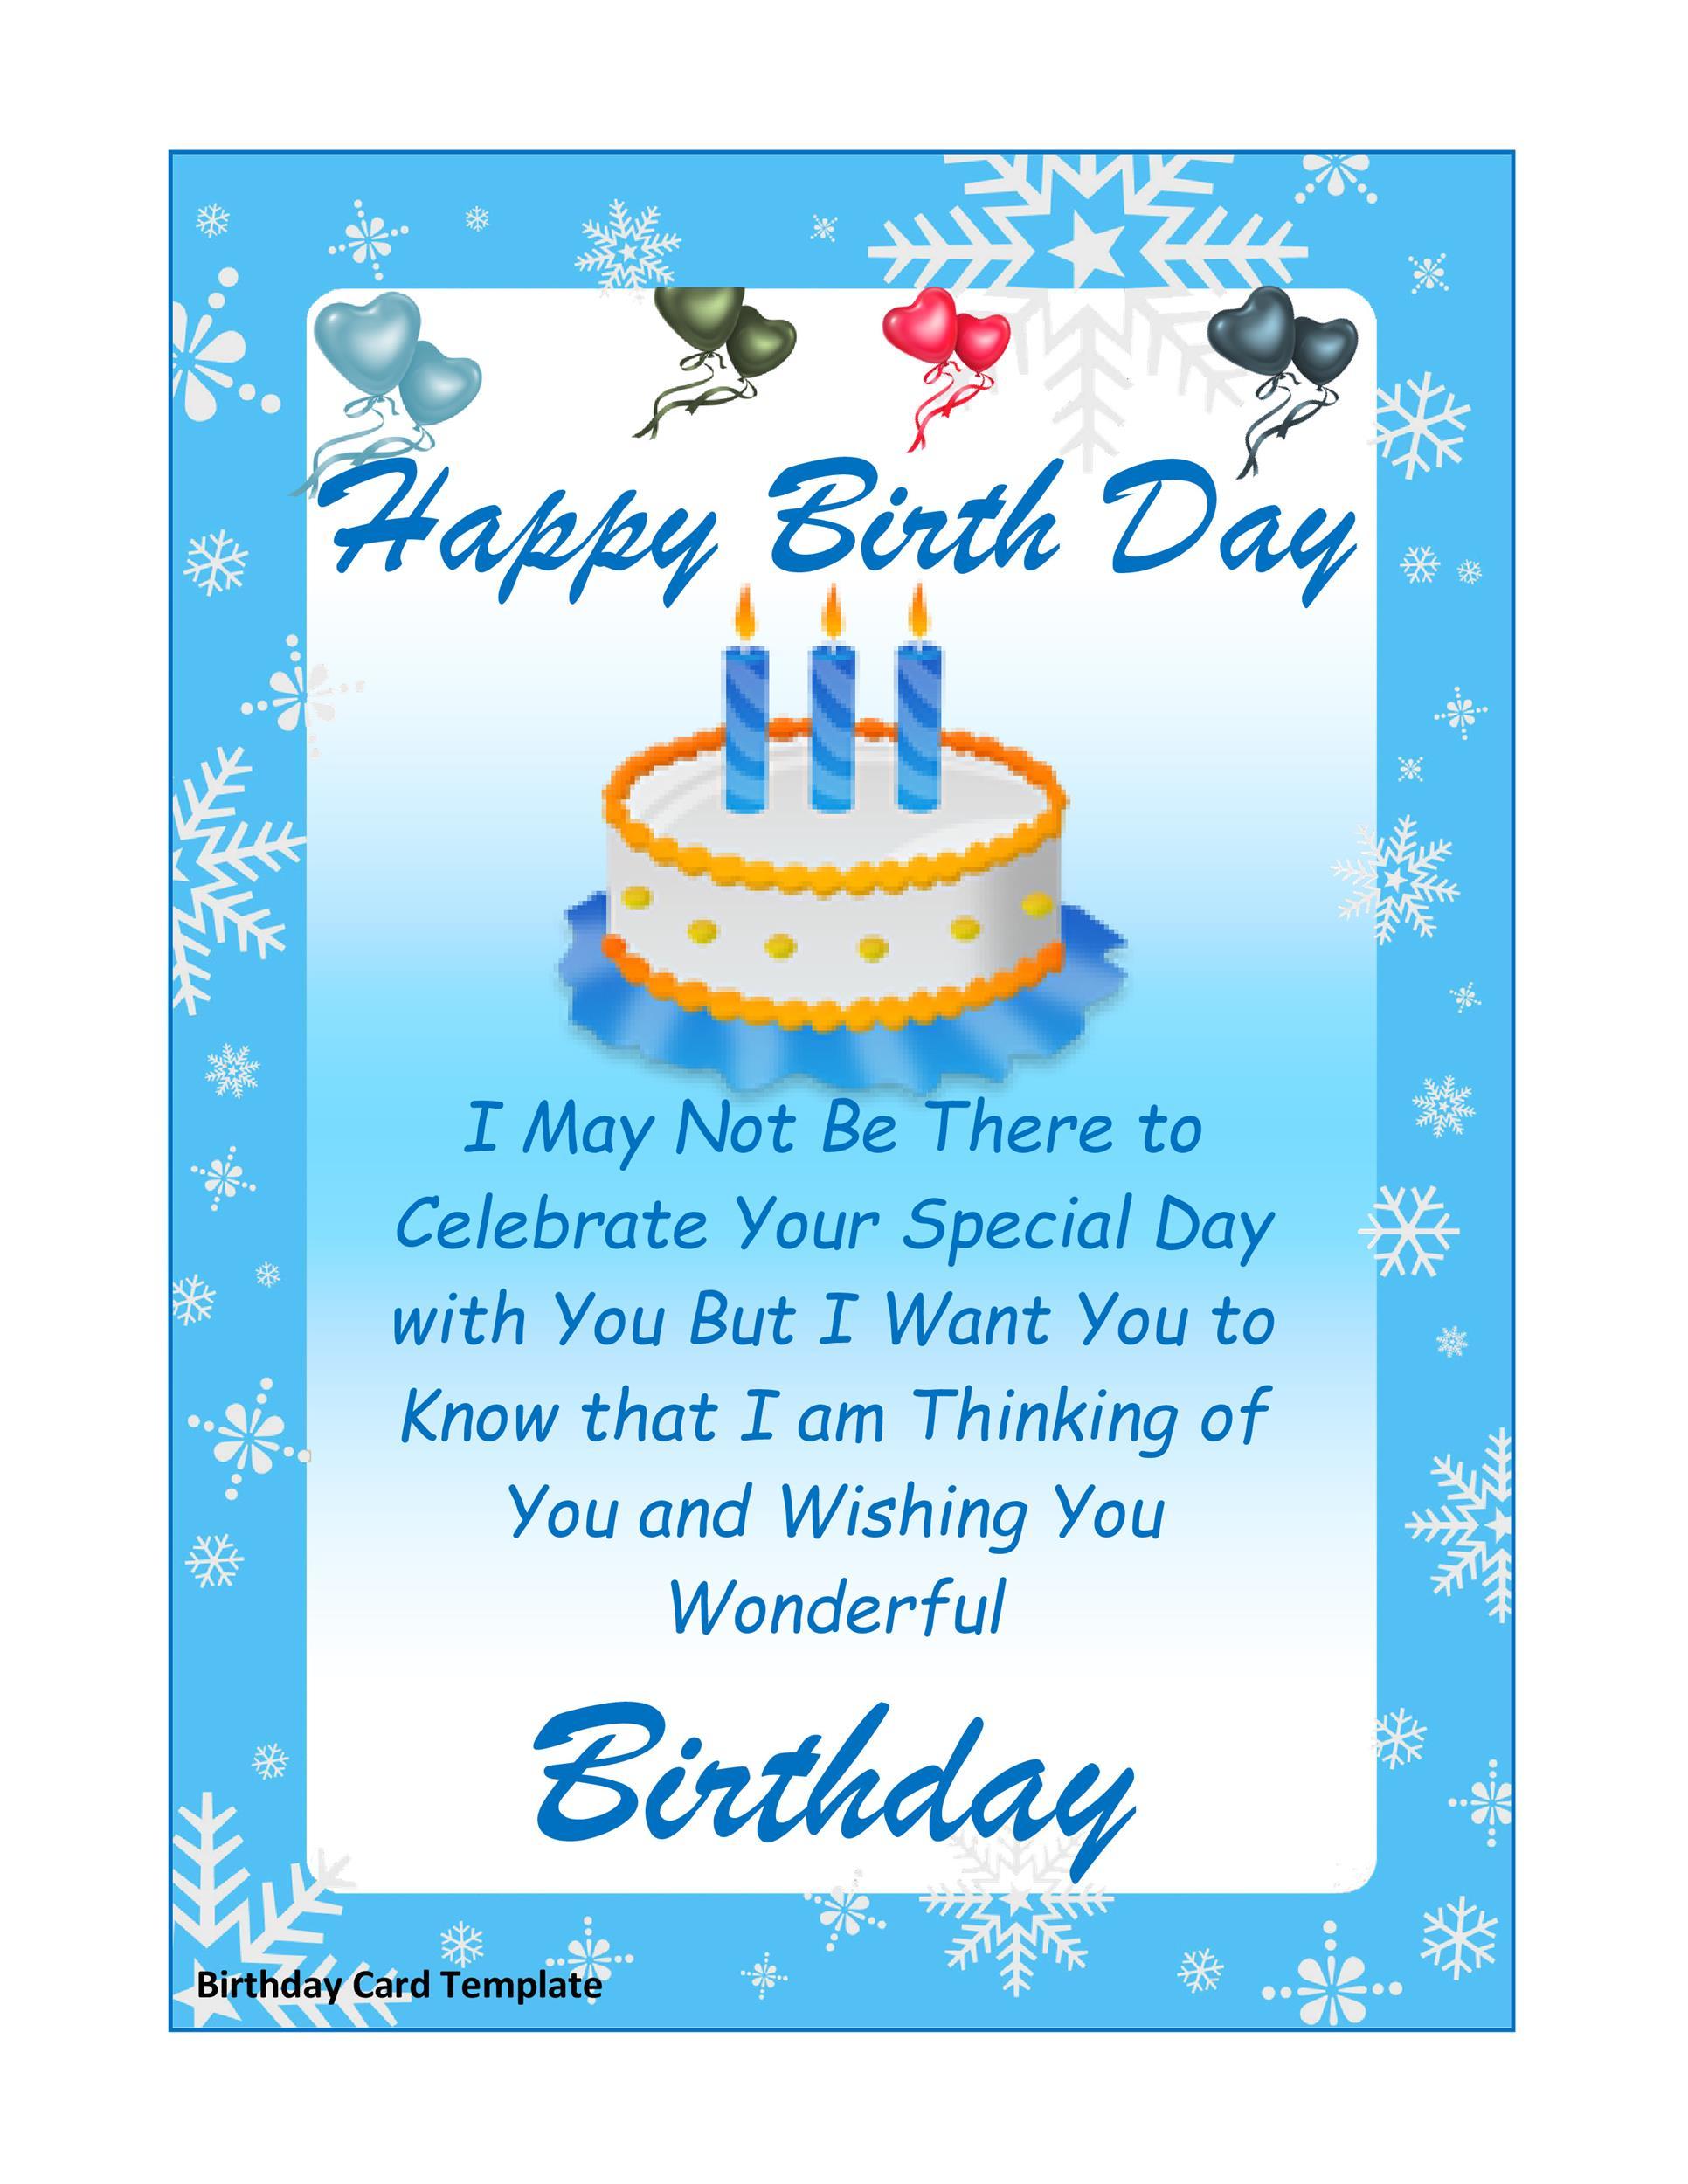 Free birthday card template 16